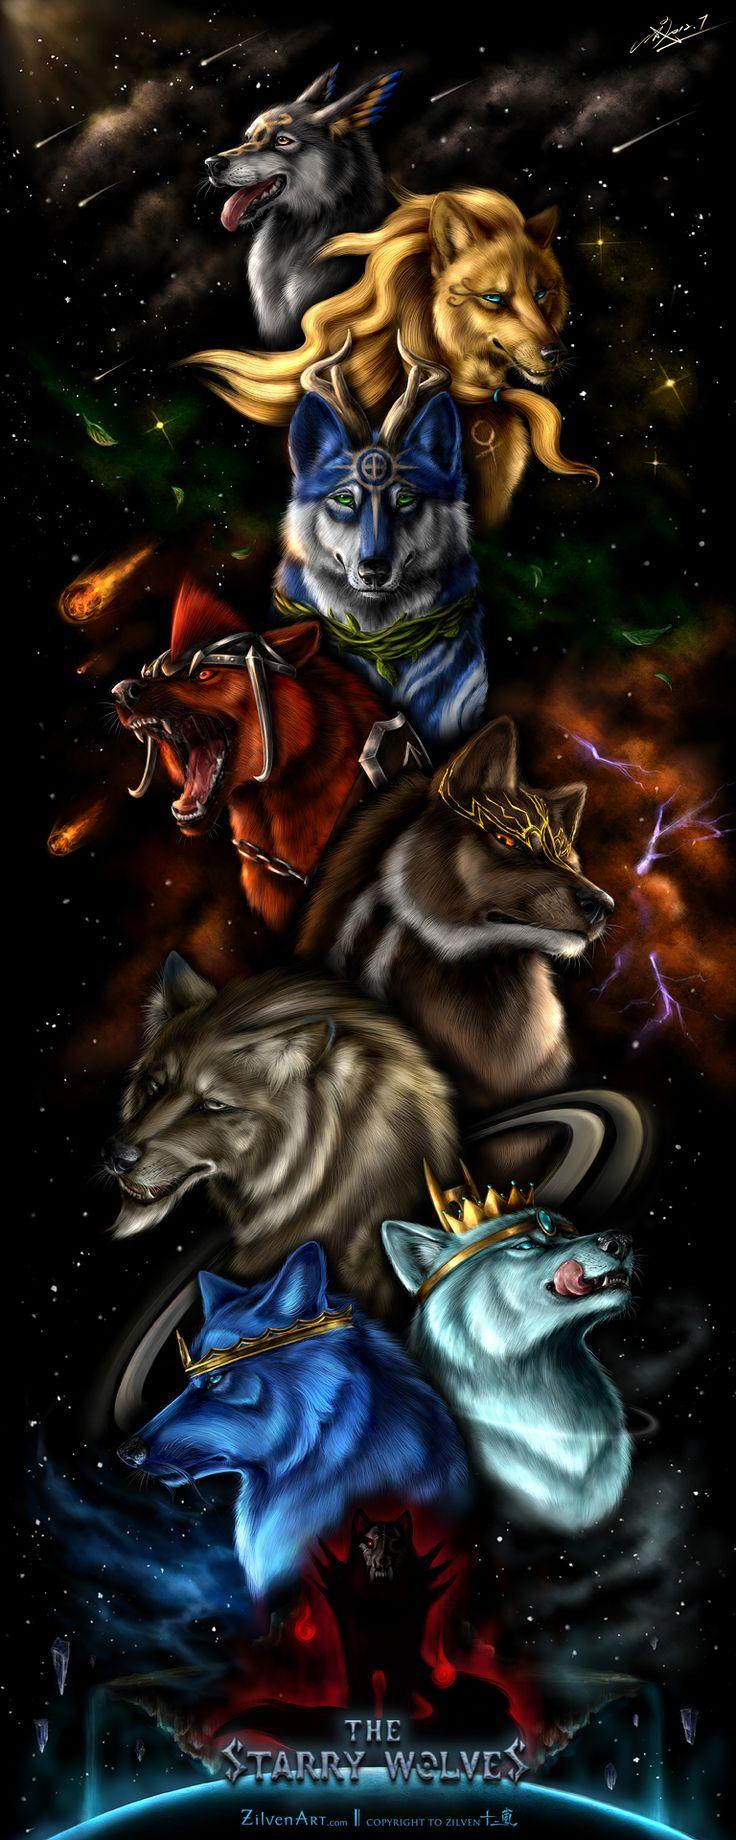 The Starry Wolves - Scroll by ZilvenArt.deviantart.com on @DeviantArt